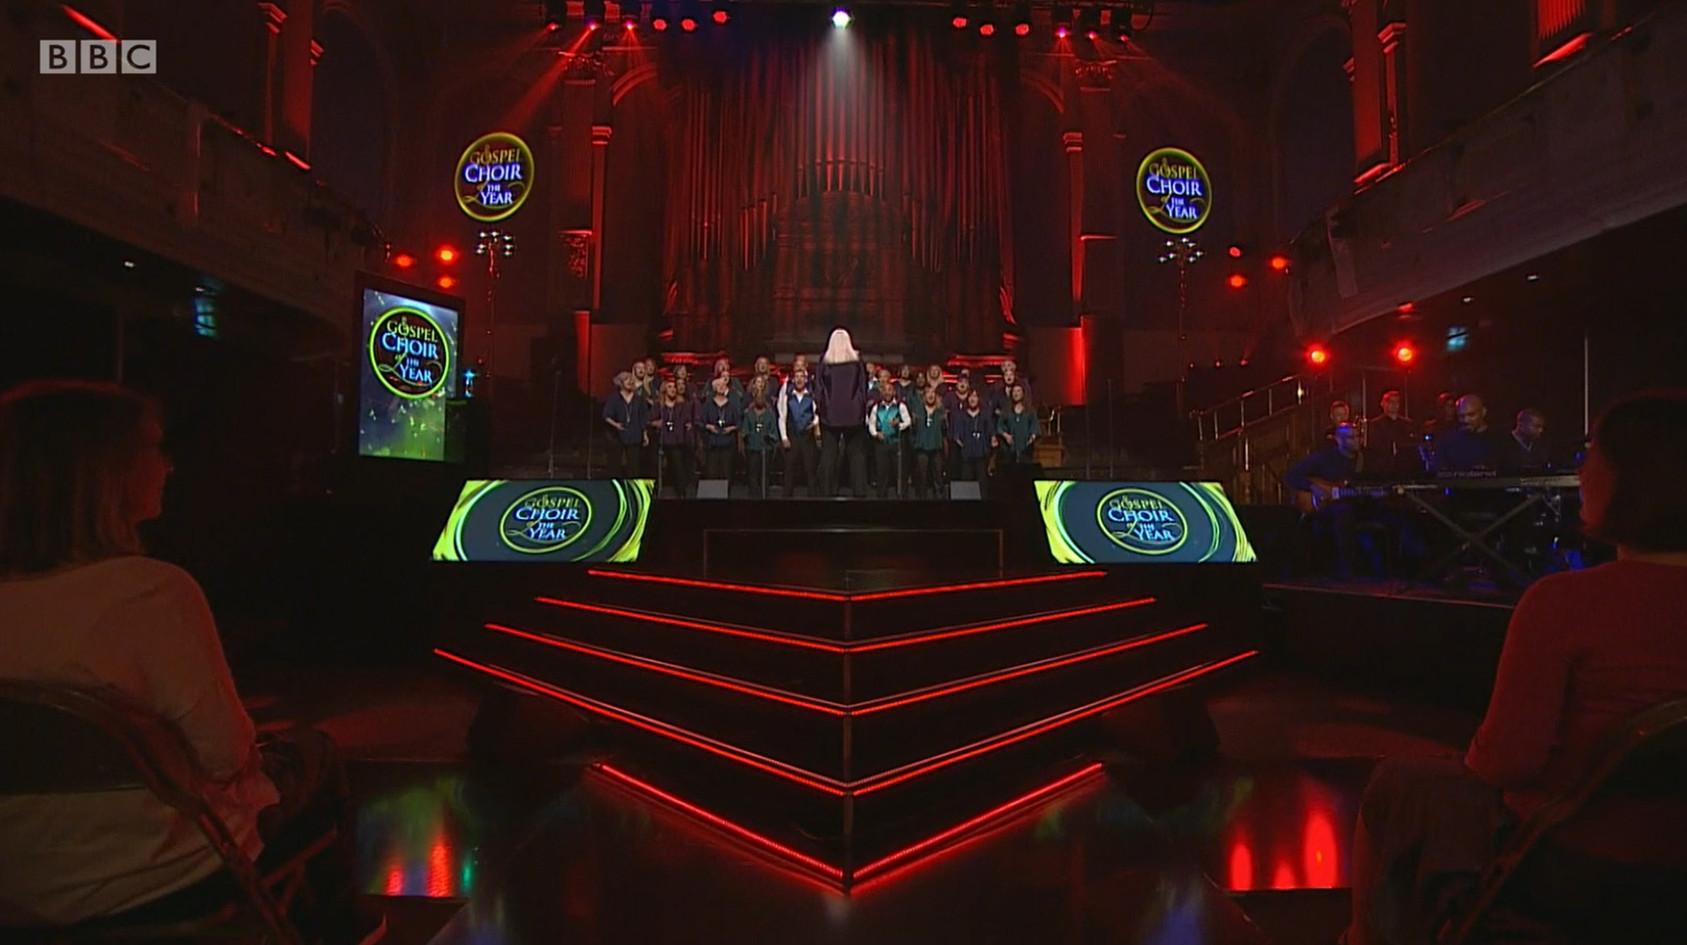 Choir of the Year